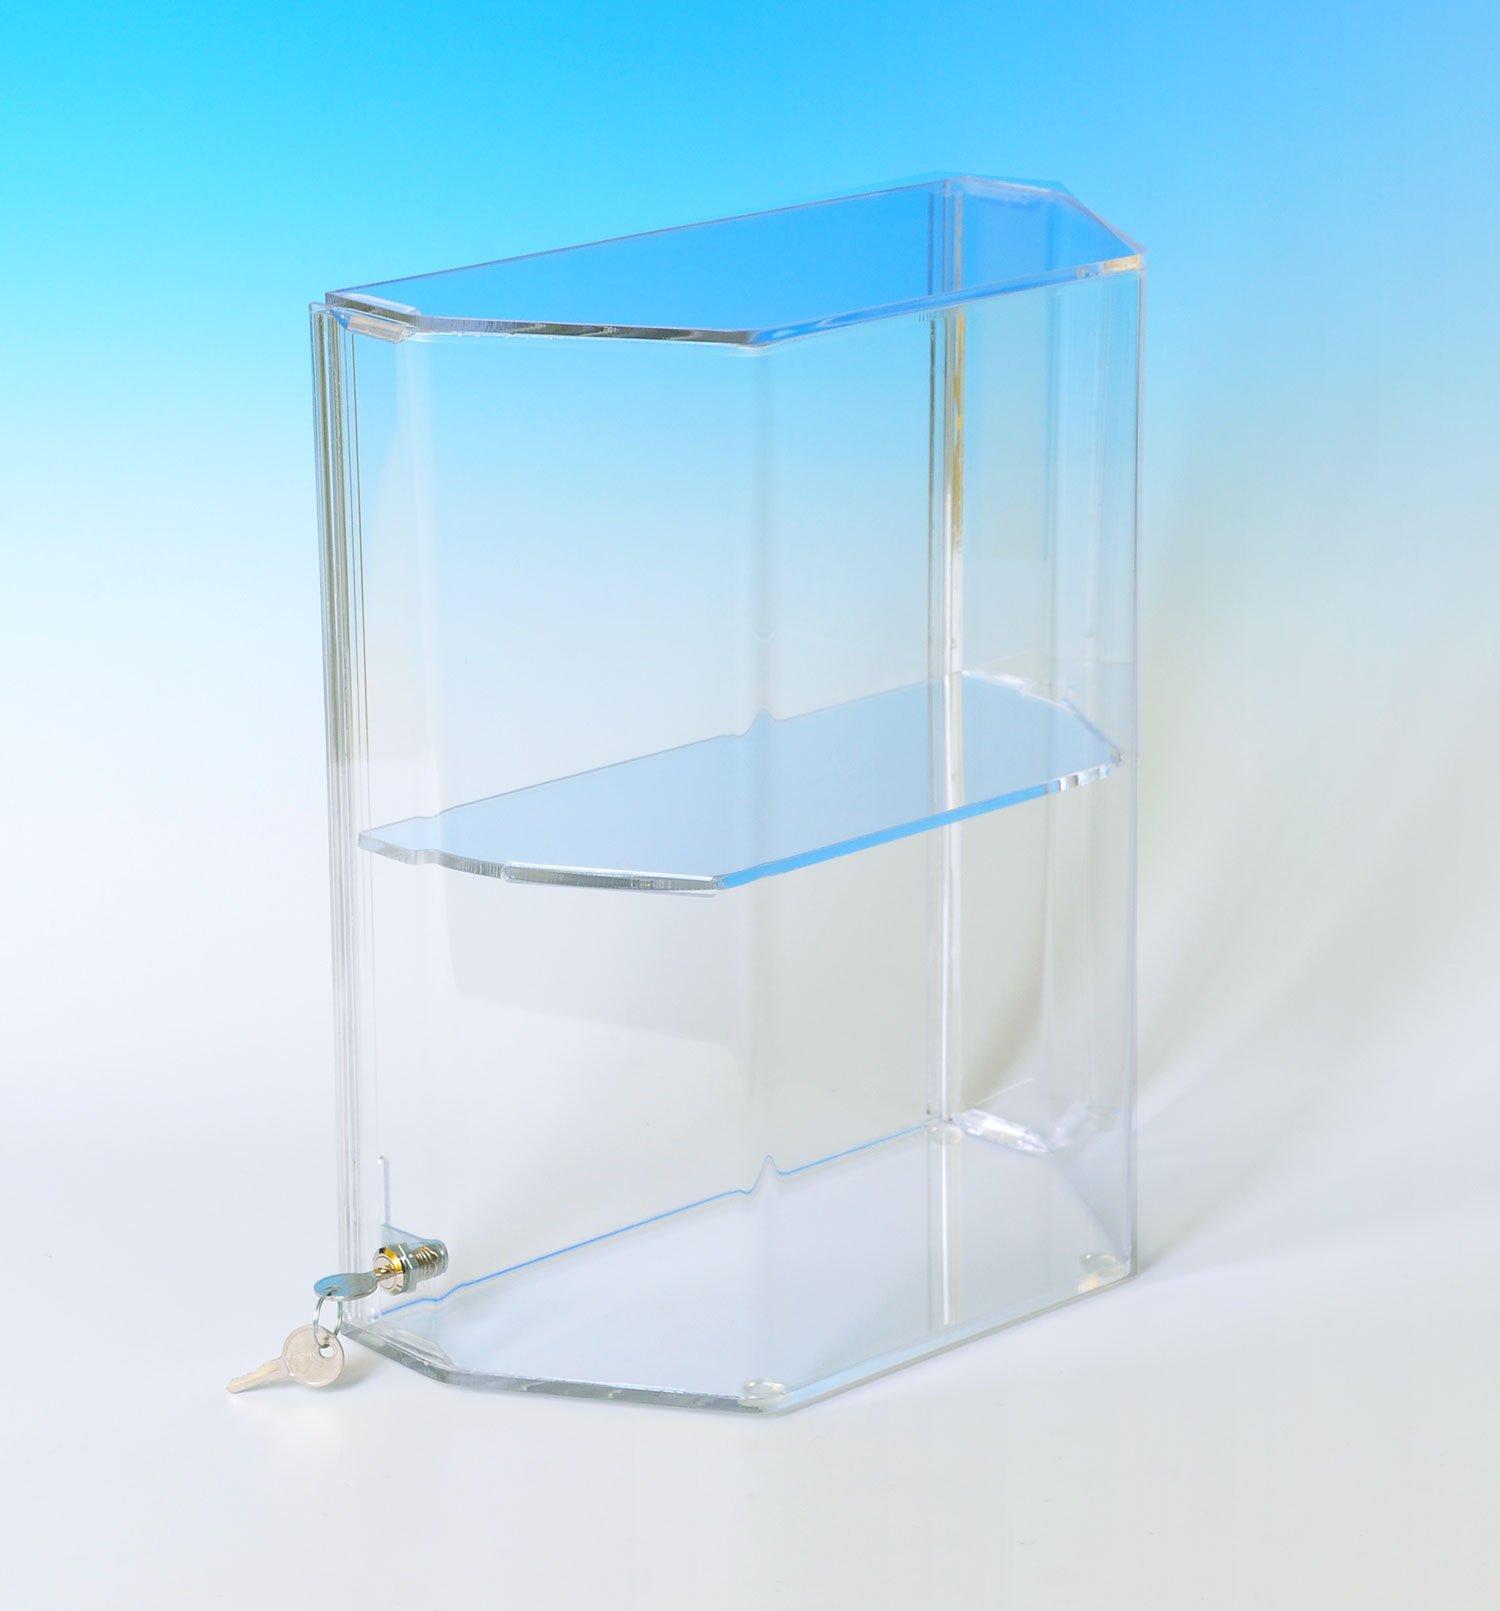 Acrylic Display Case | Dormer Window Case with three Shelves | Locking Showcase | DW163